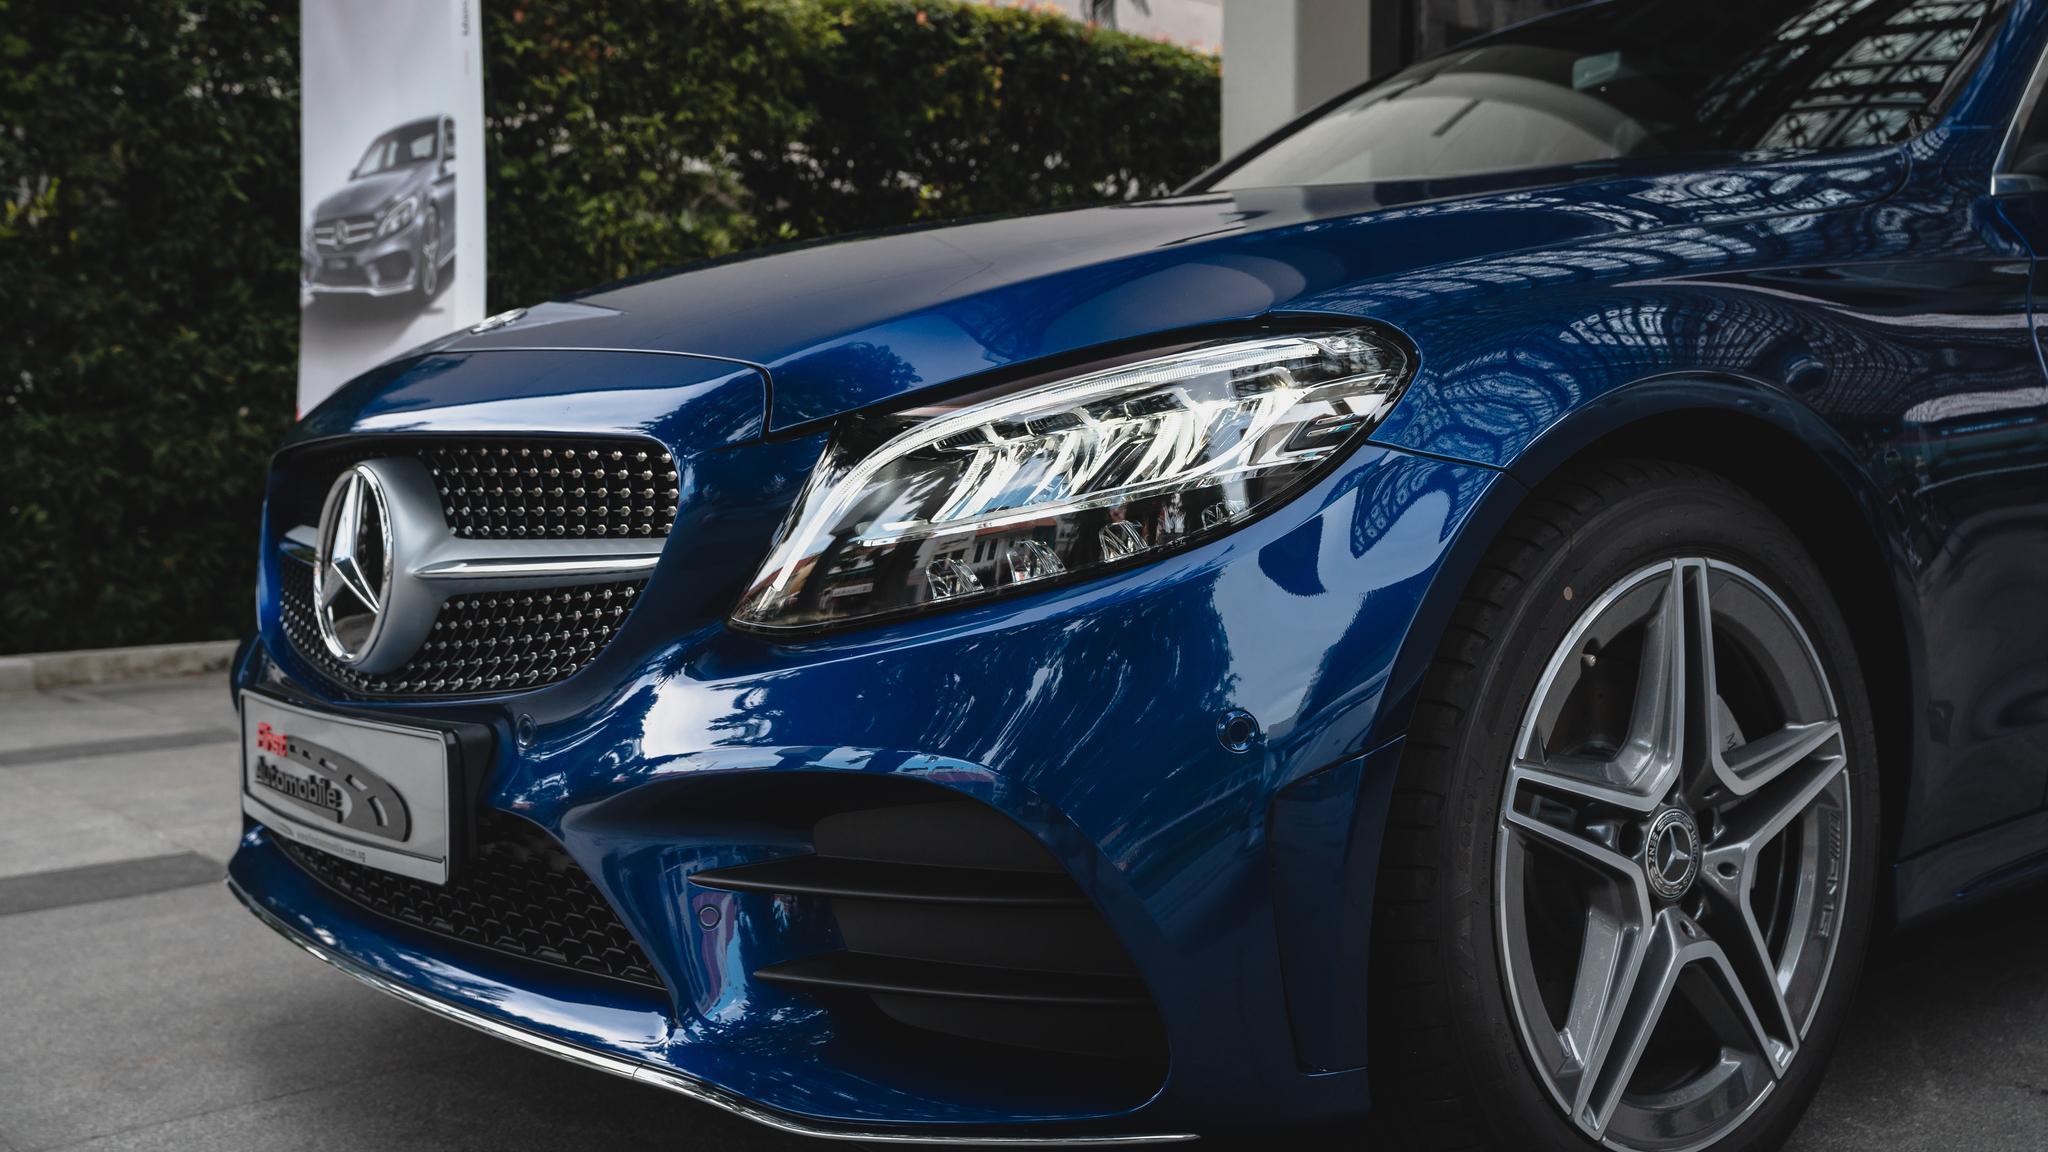 Mercedes Benz C200 AMG EDITION